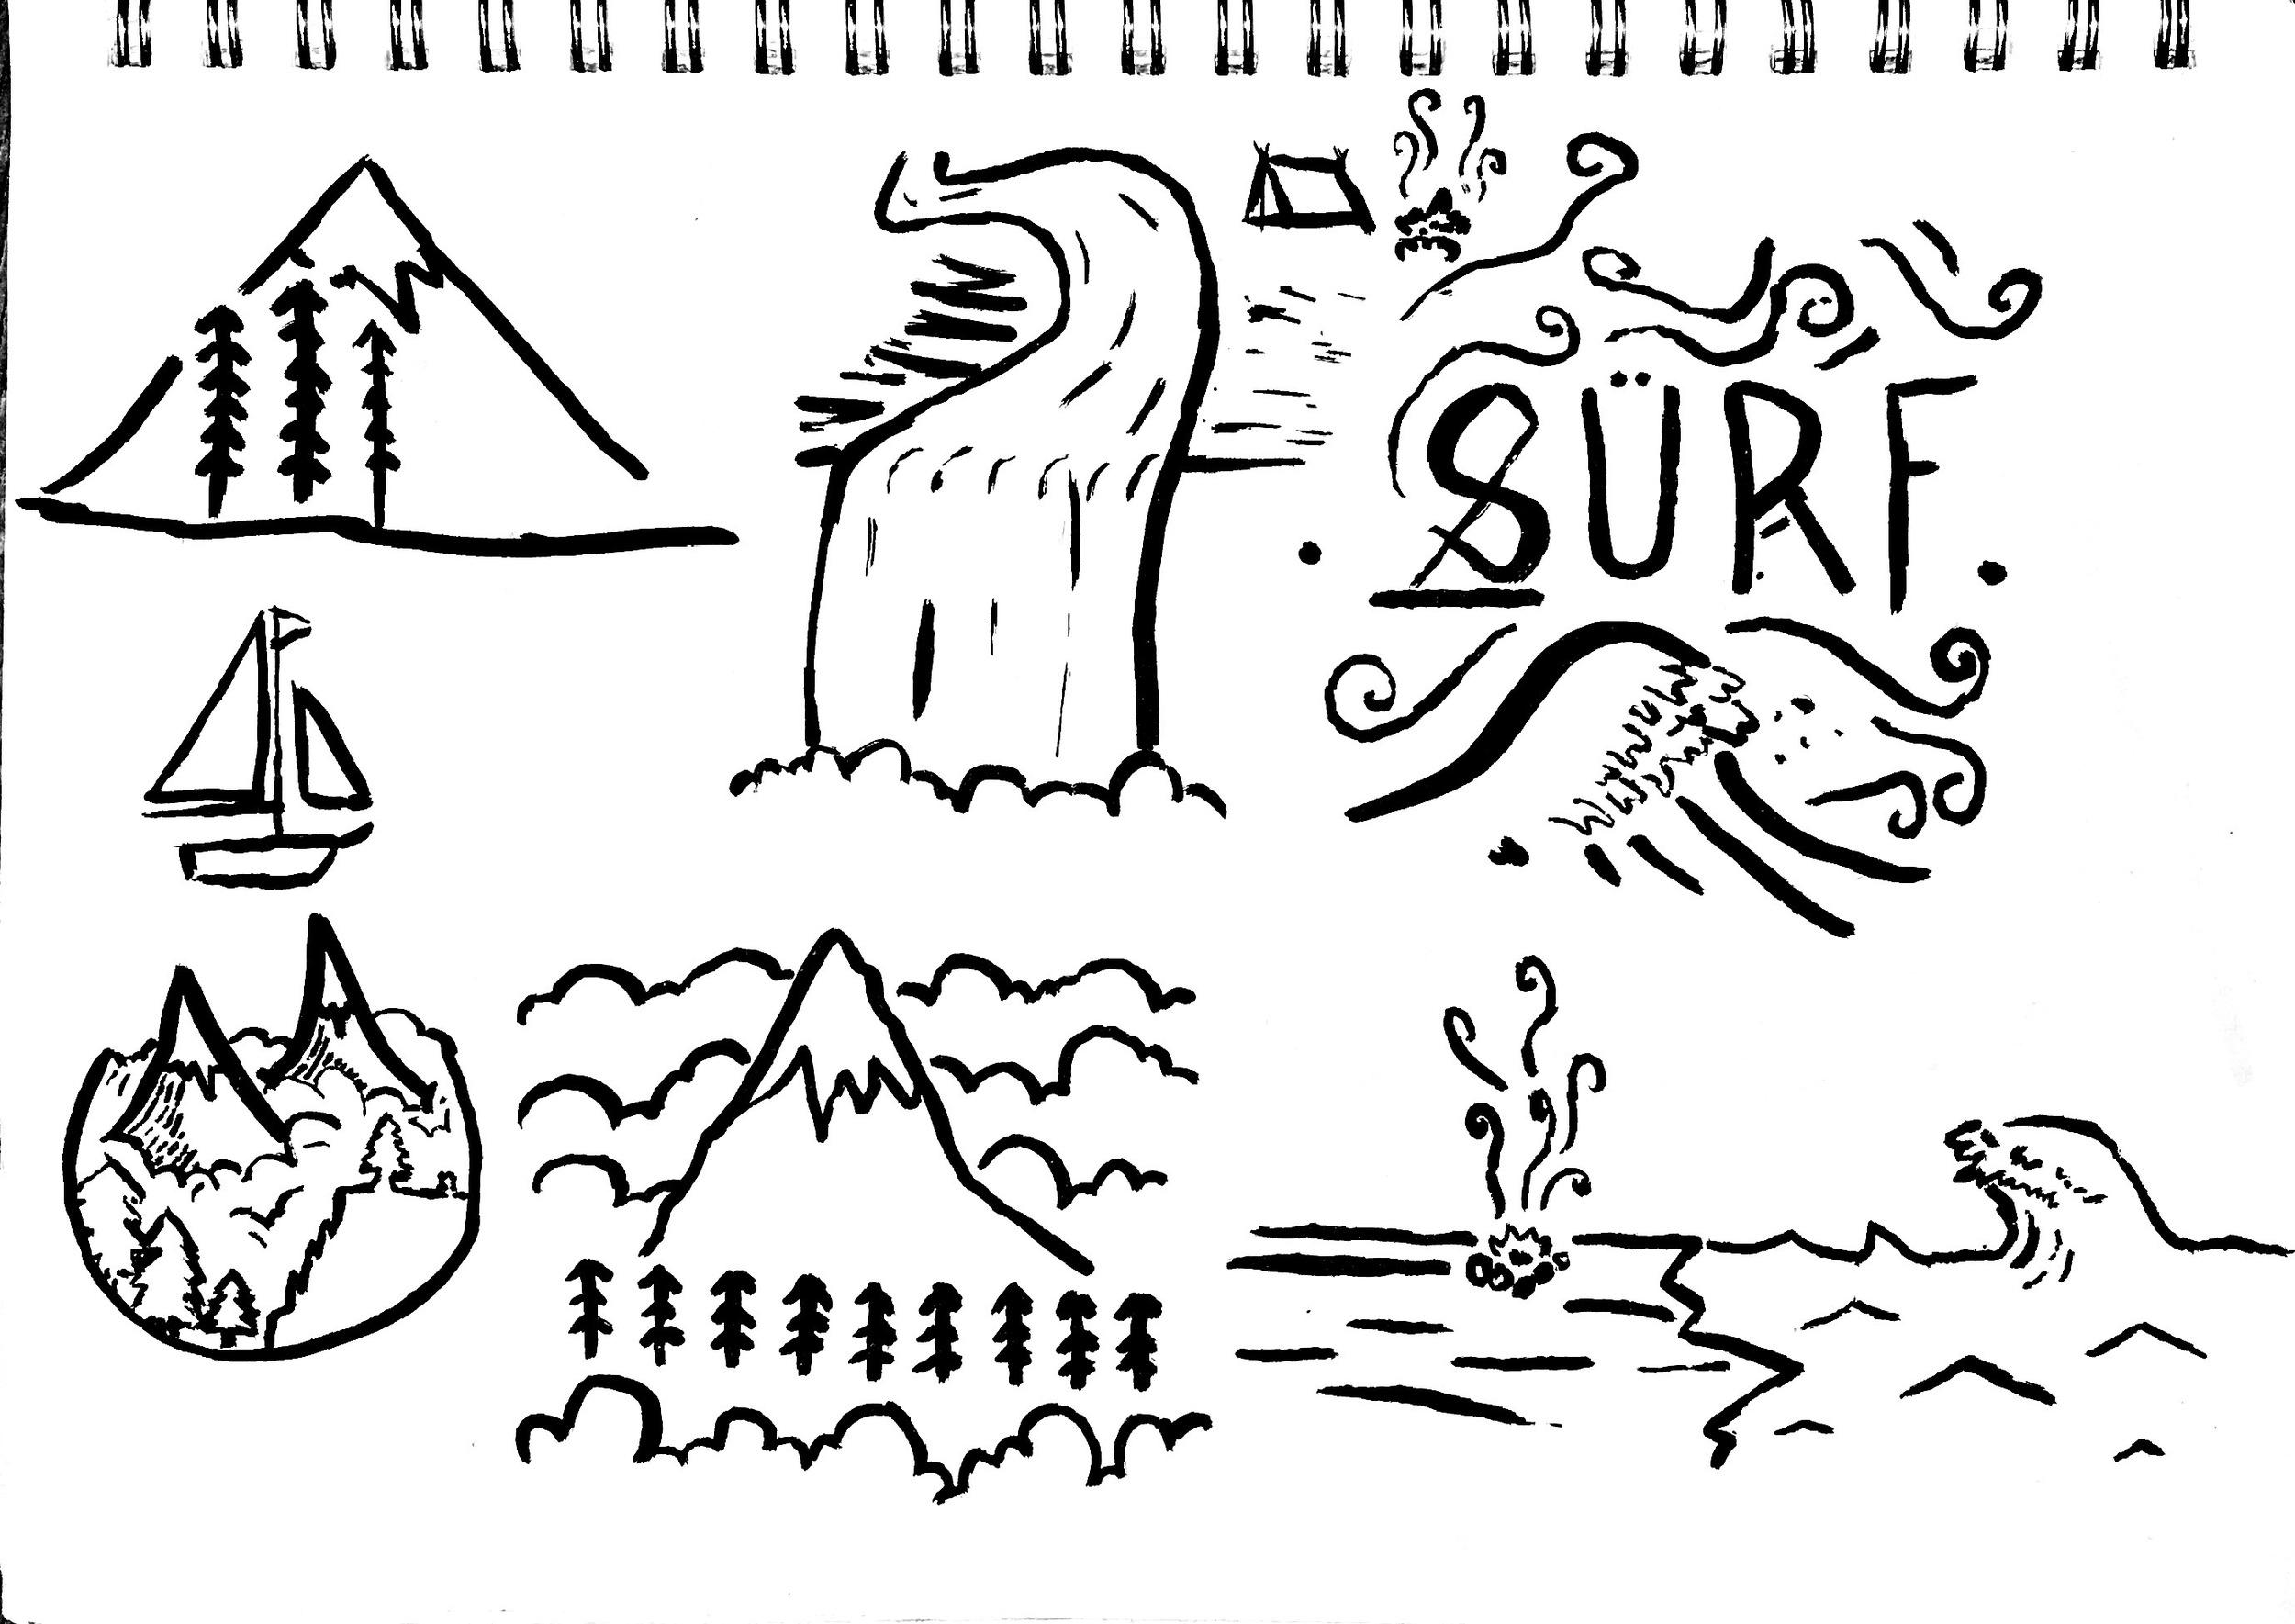 Kris's doodles